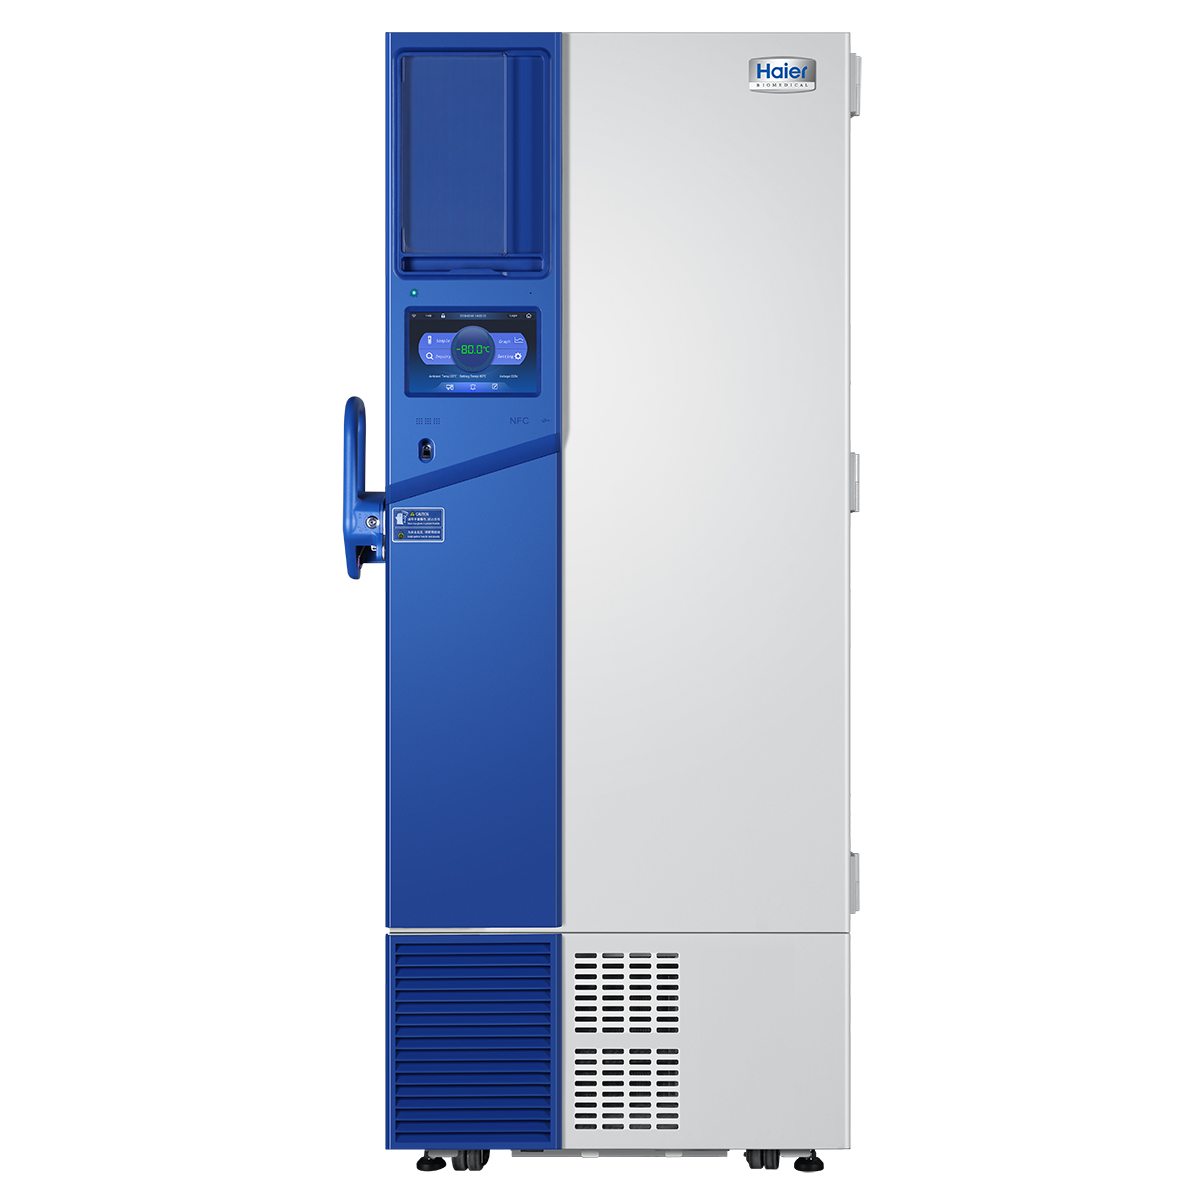 双子芯超低温冰箱DW-86L578ST